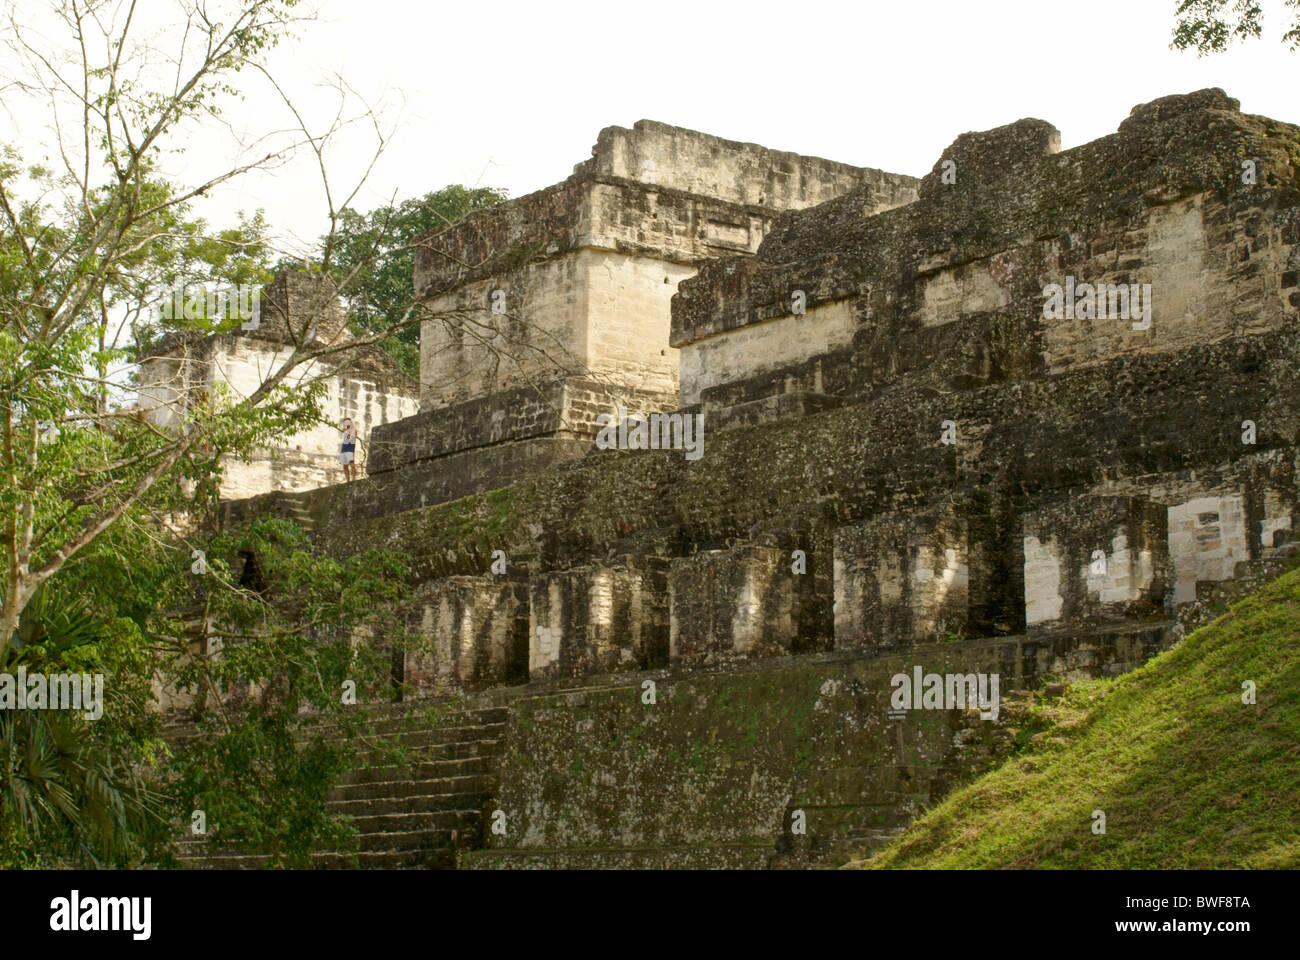 North Acropolis at the Maya ruins of Tikal, El Peten, Guatemala. Tikal is a UNESCO World Heritage Site. - Stock Image